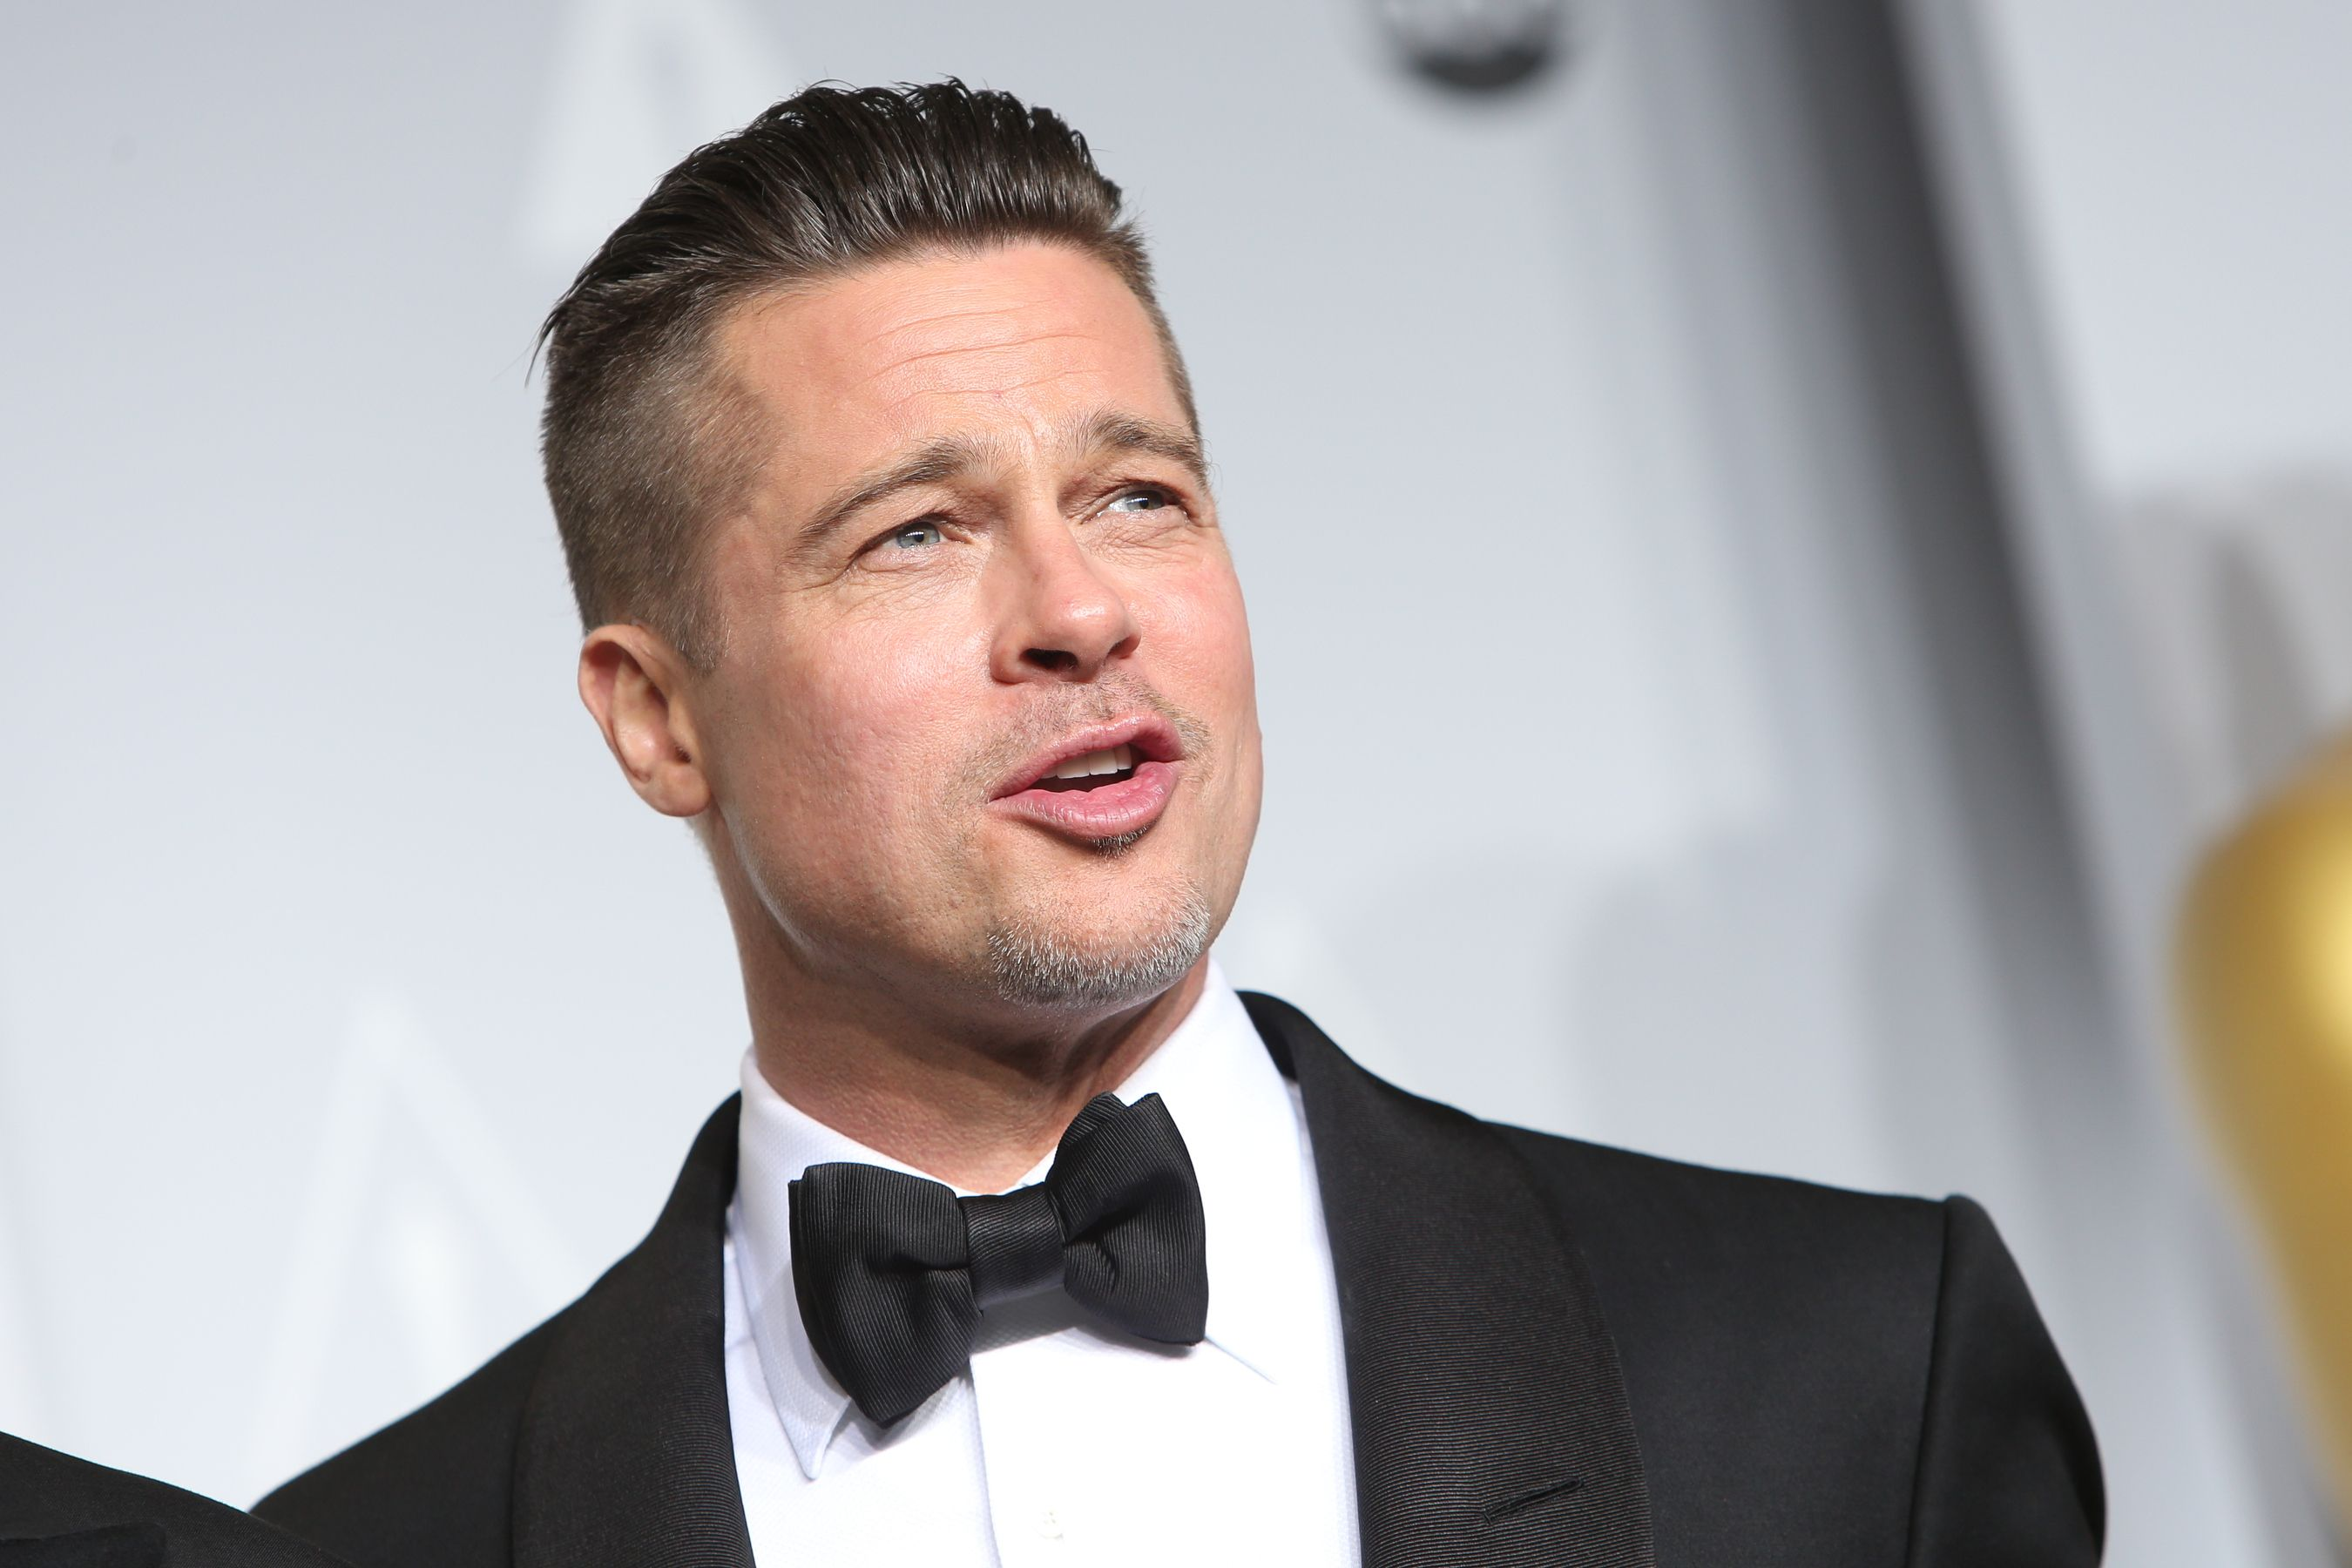 20. Brad Pitt